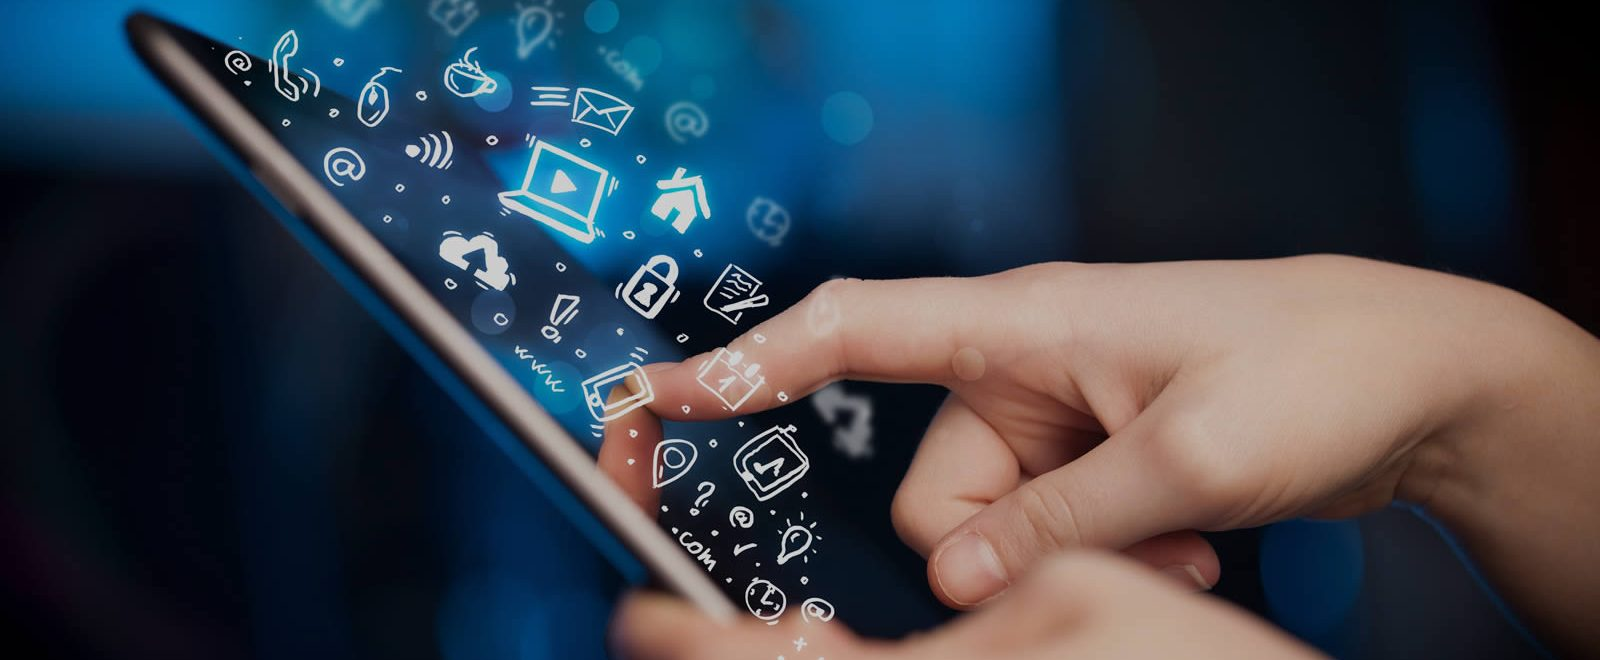 gerenciamento-de-redes-sociais